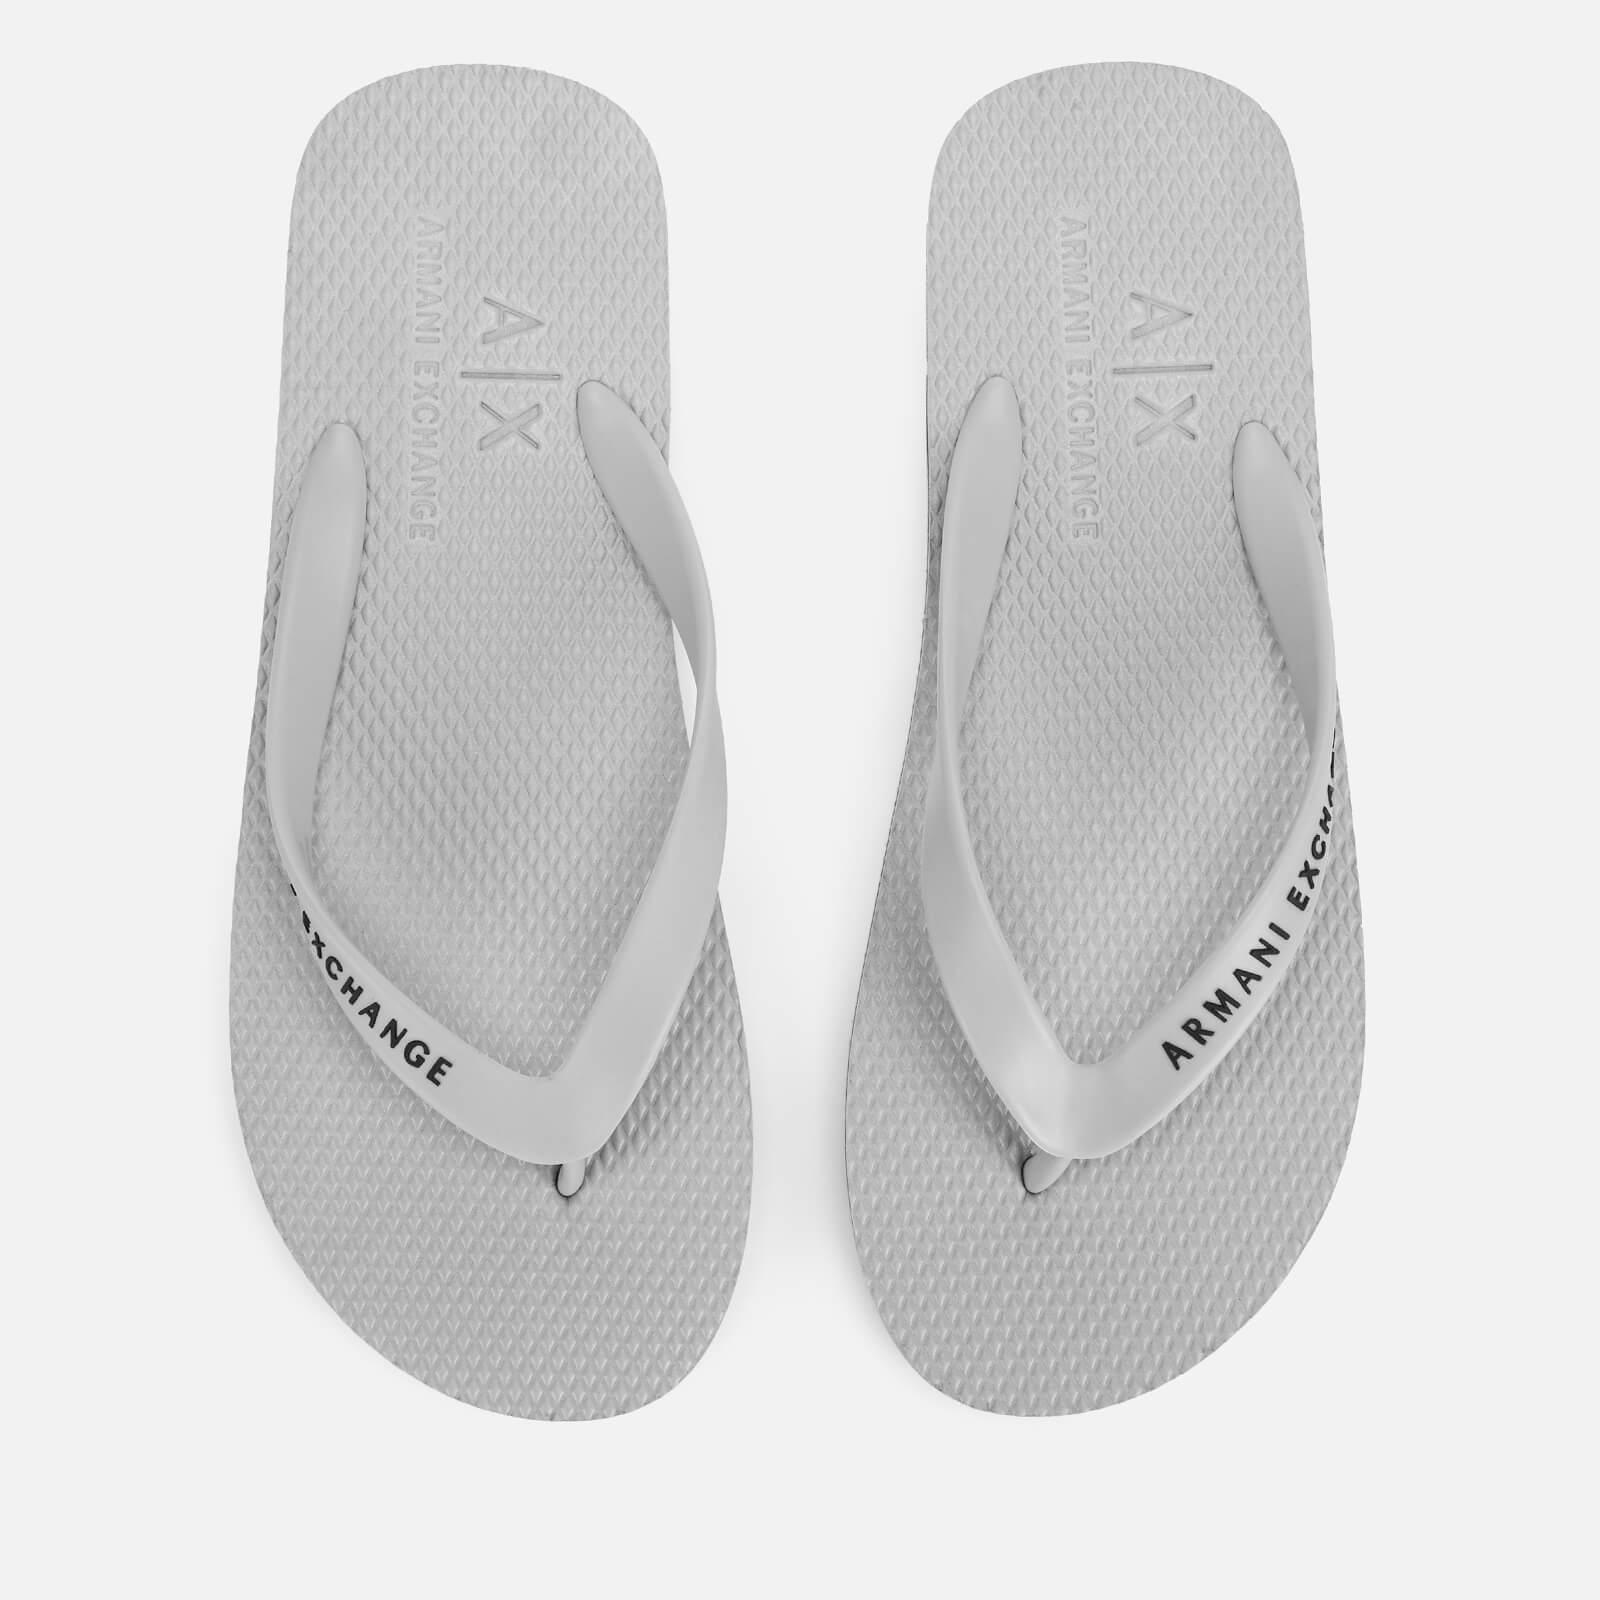 f2da8981d1e3 Armani Exchange Men s Flip Flops - Alloy Mens Footwear